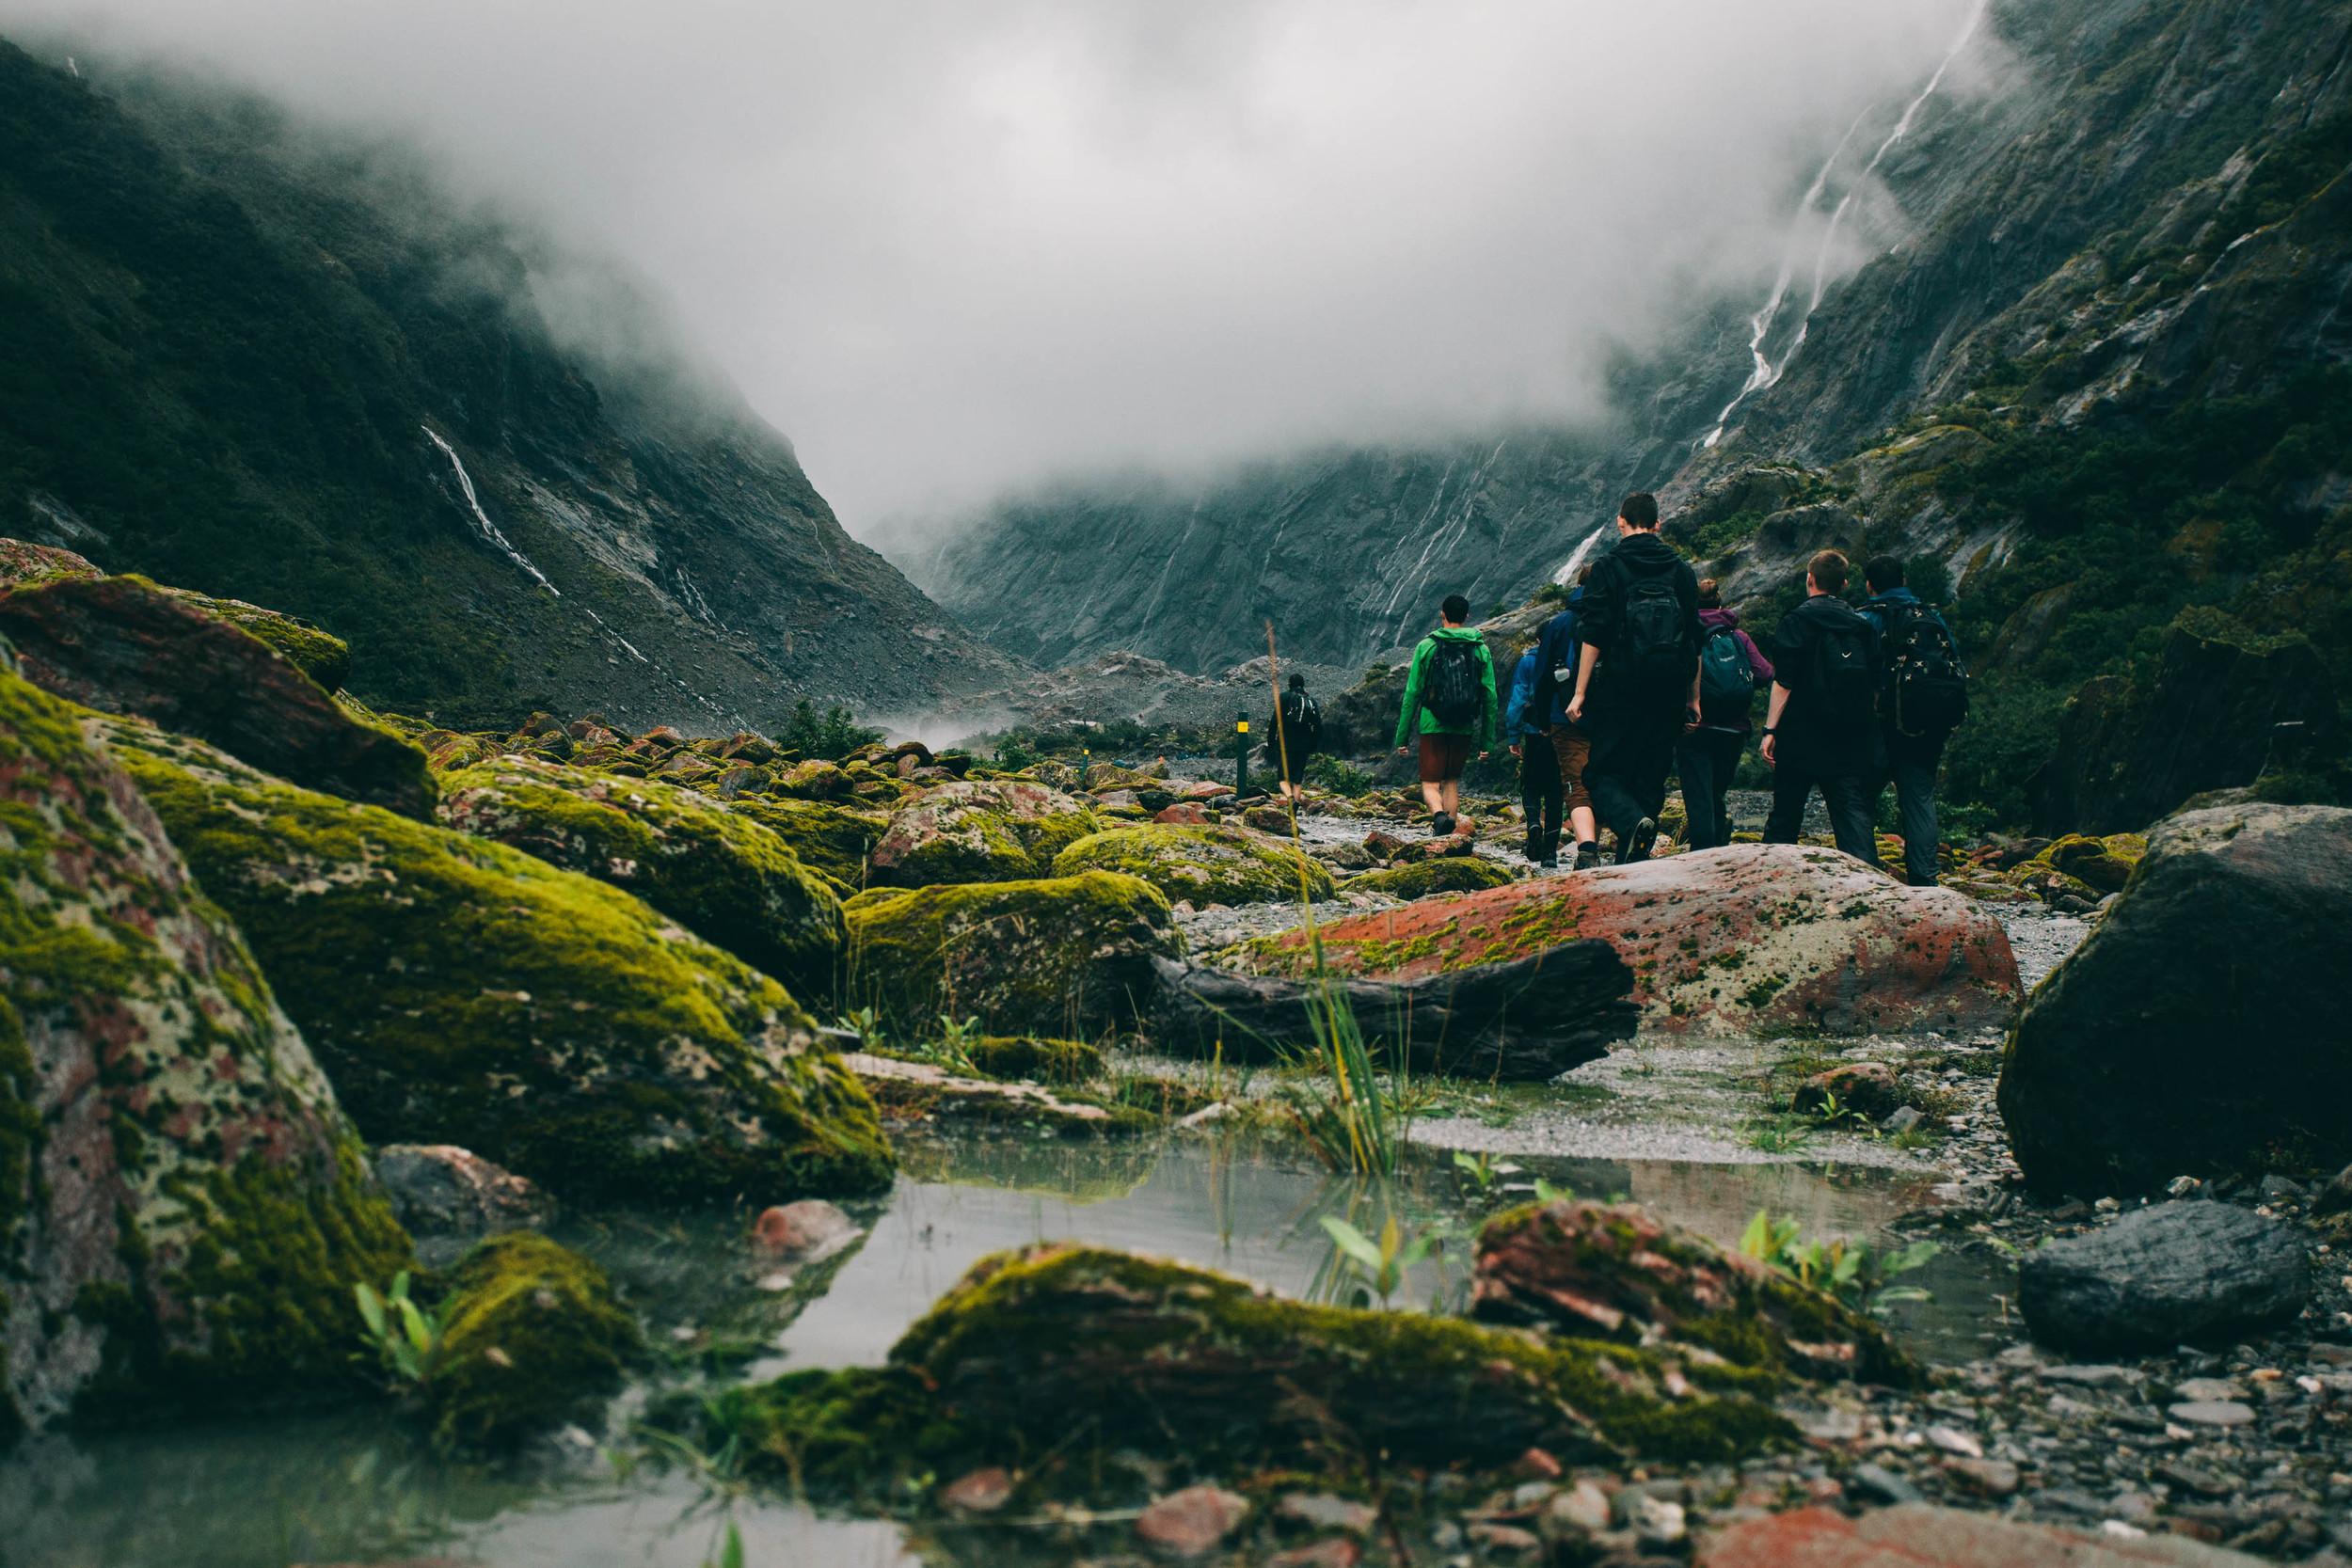 The walk to the Franz Josef Glacier